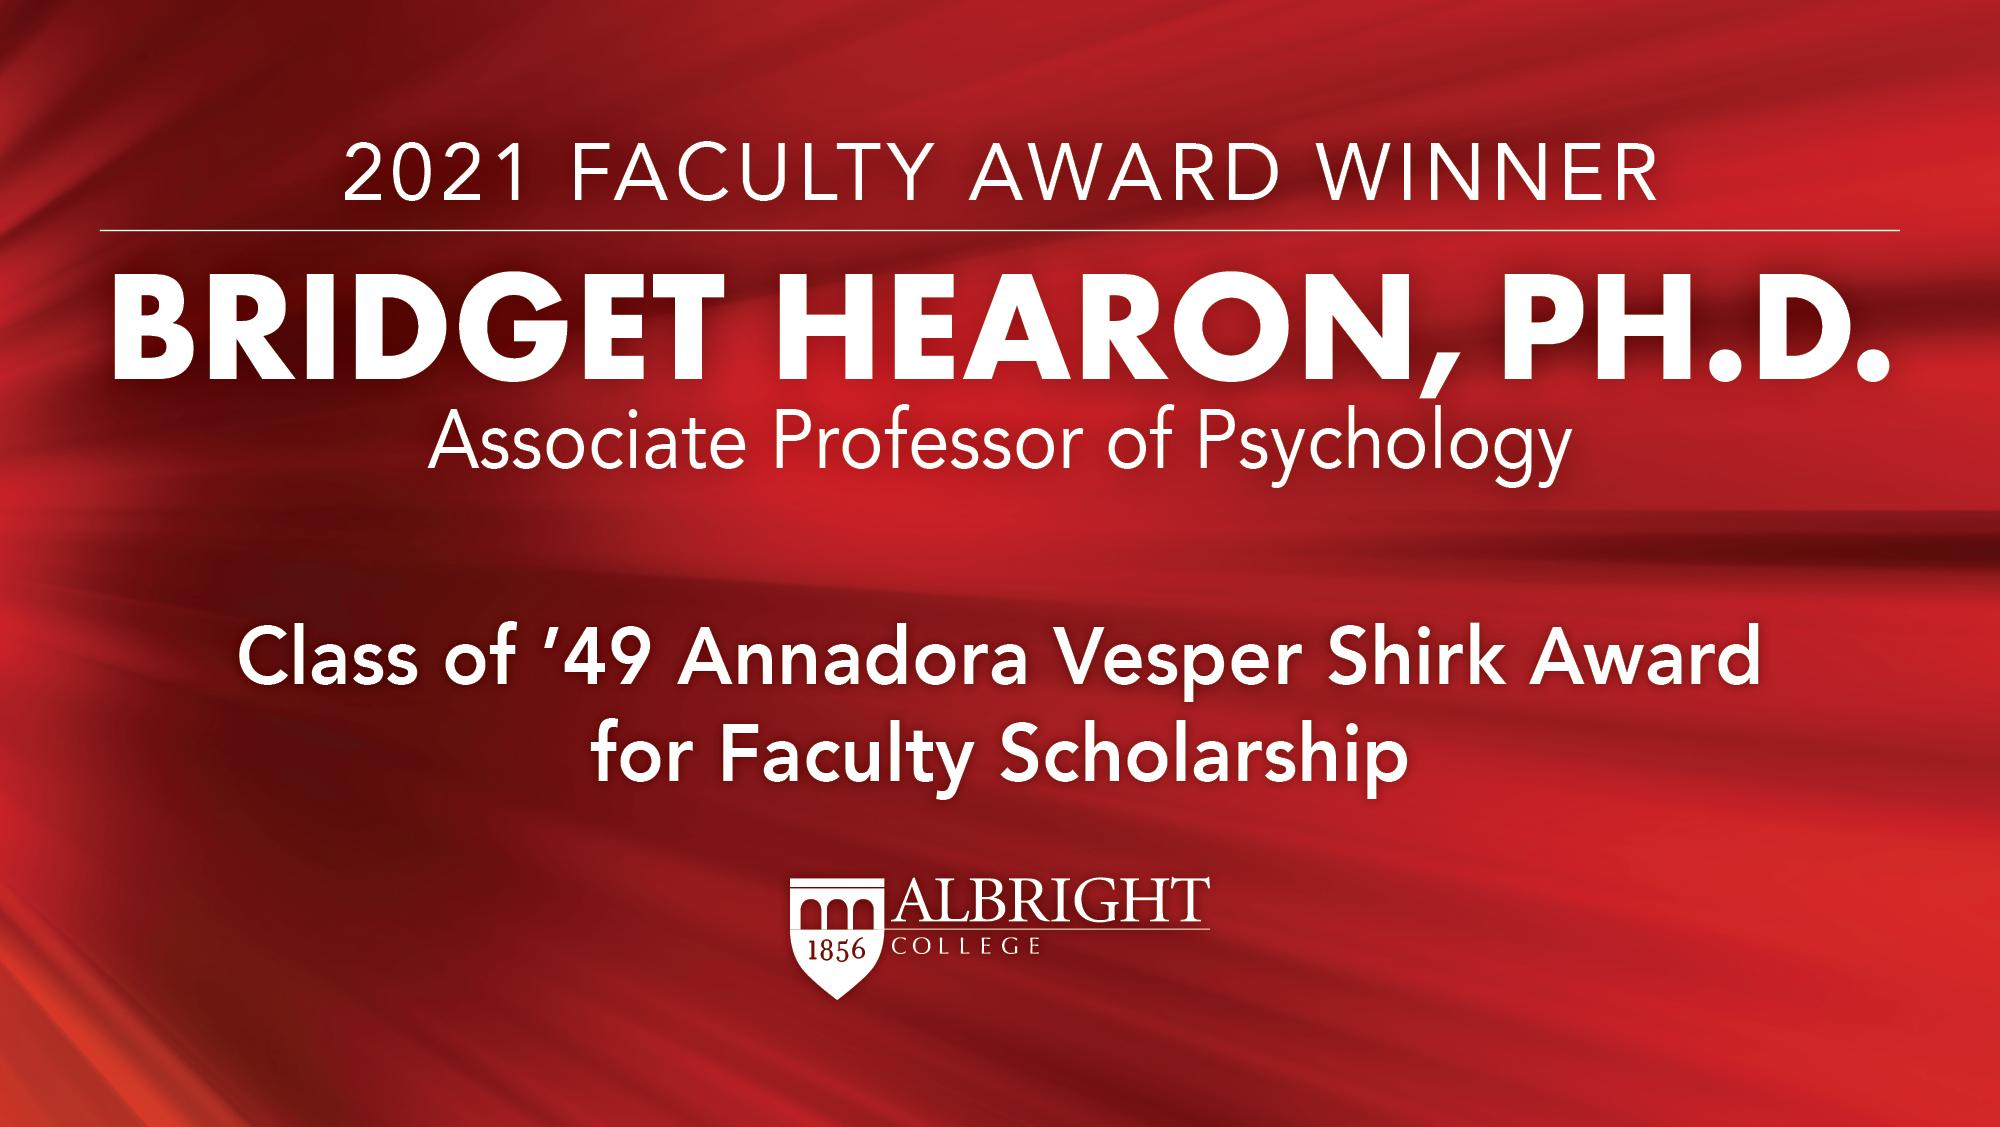 Bridget Hearon, Ph.D.